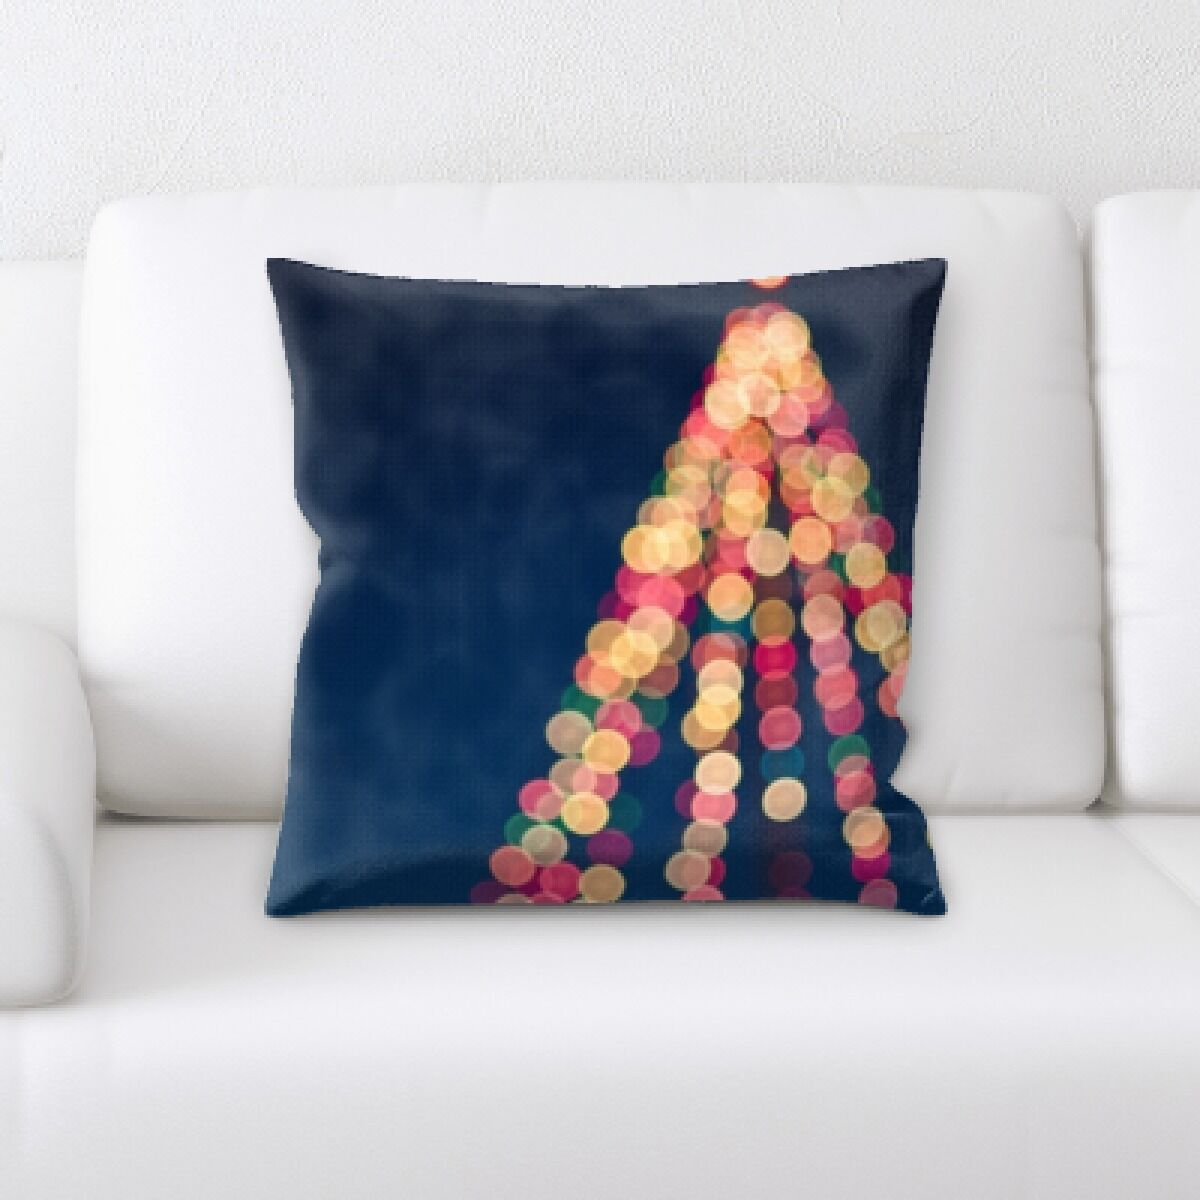 Congo Christmas Tree (2) Throw Pillow